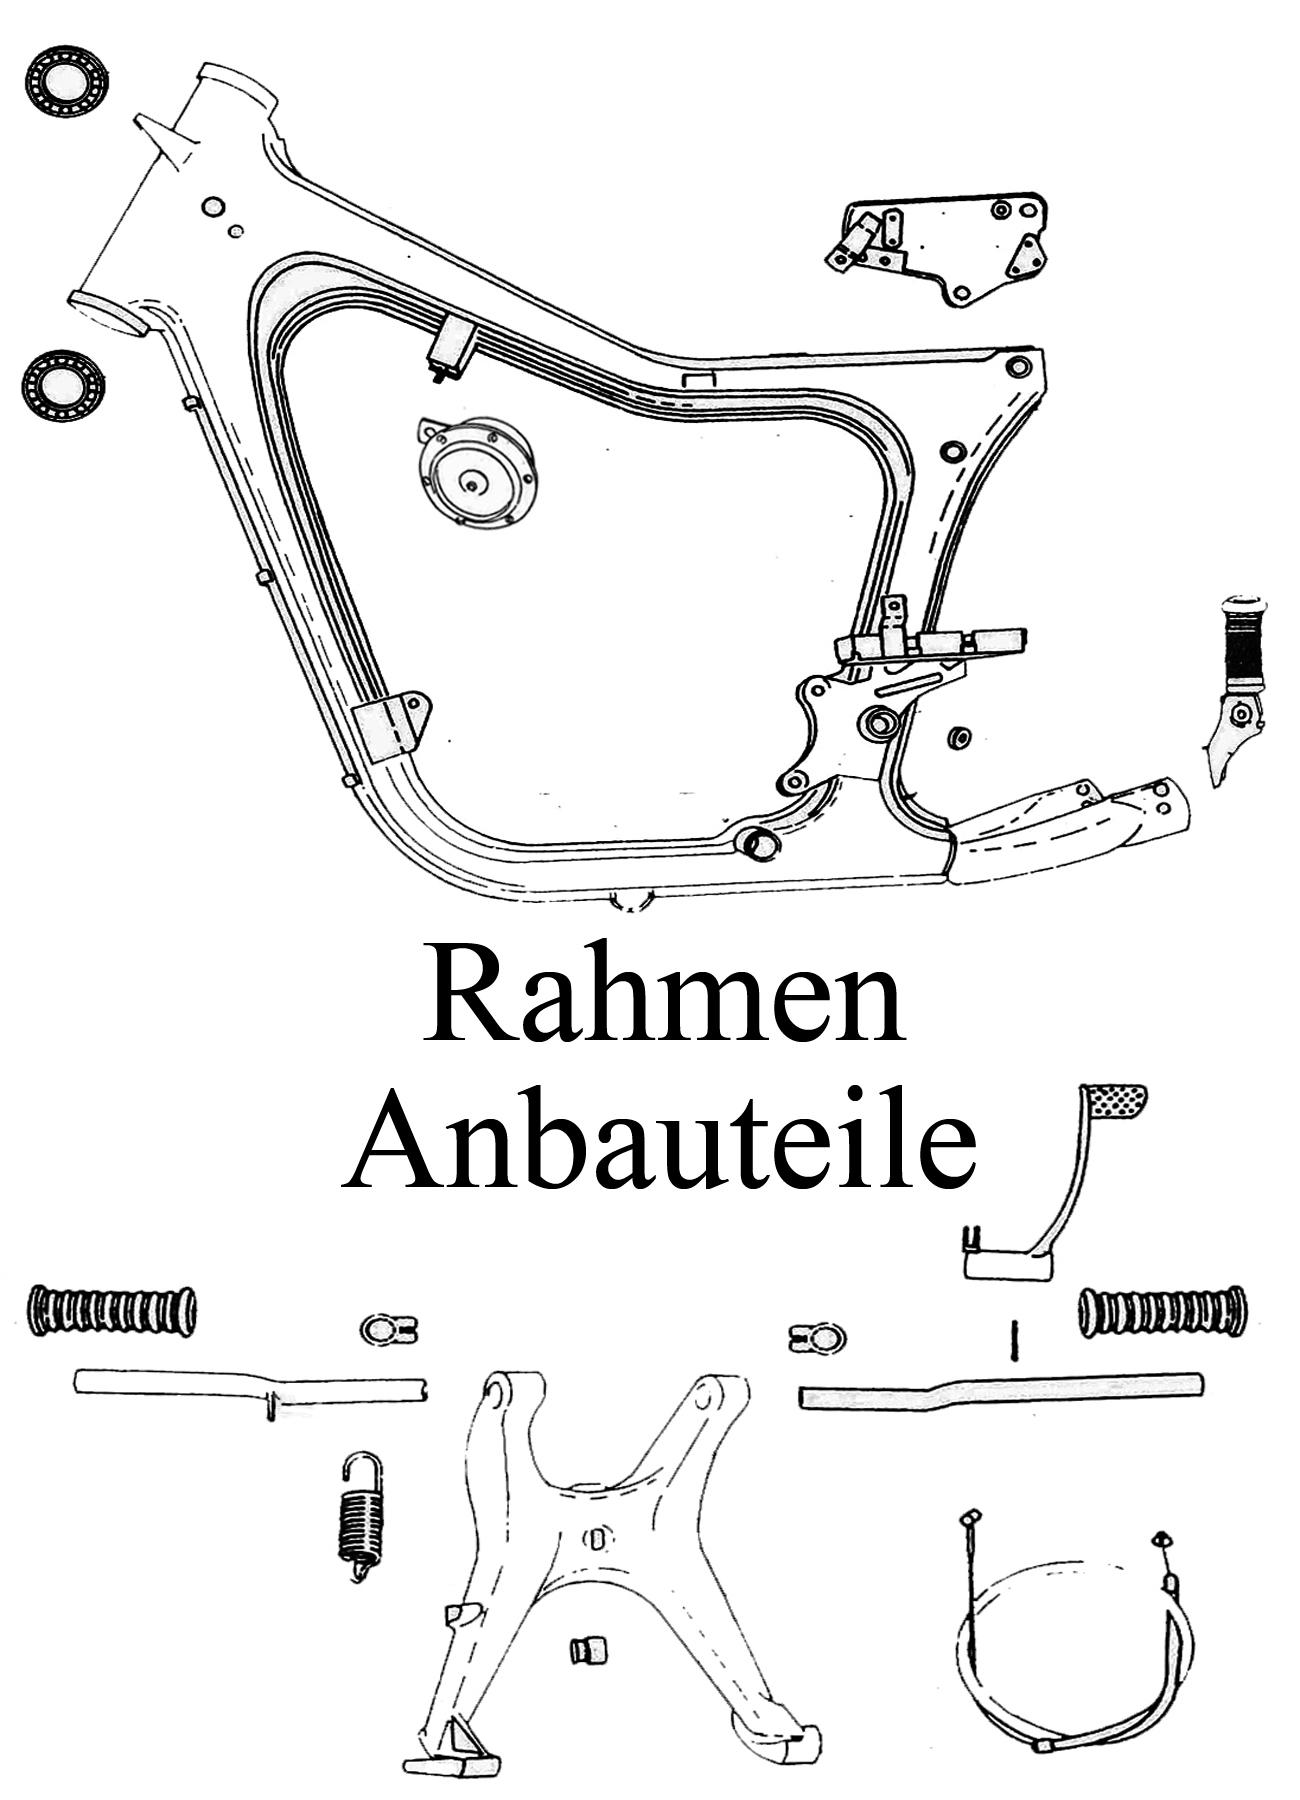 DDR-Motorrad MZ TS 125 150 Ersatzteile Rahmen Anbauteile